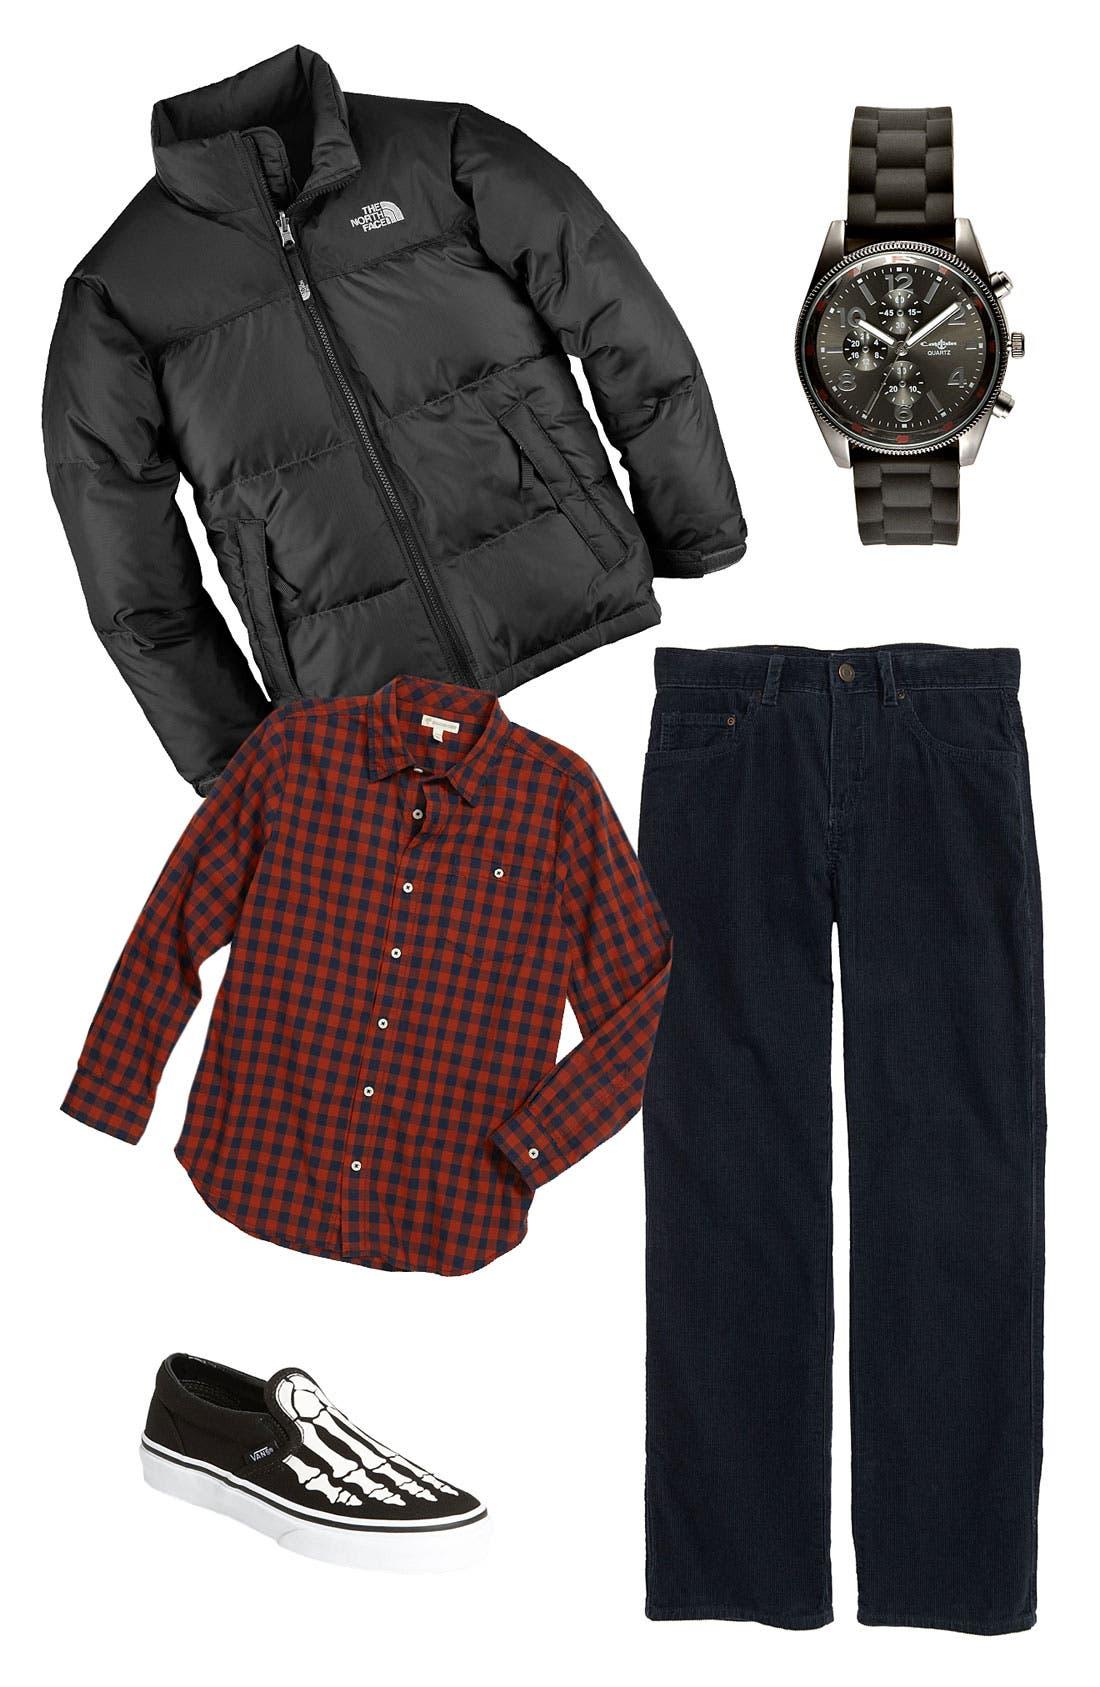 Alternate Image 1 Selected - The North Face Jacket & Tucker + Tate Shirt & Pants (Big Boys)